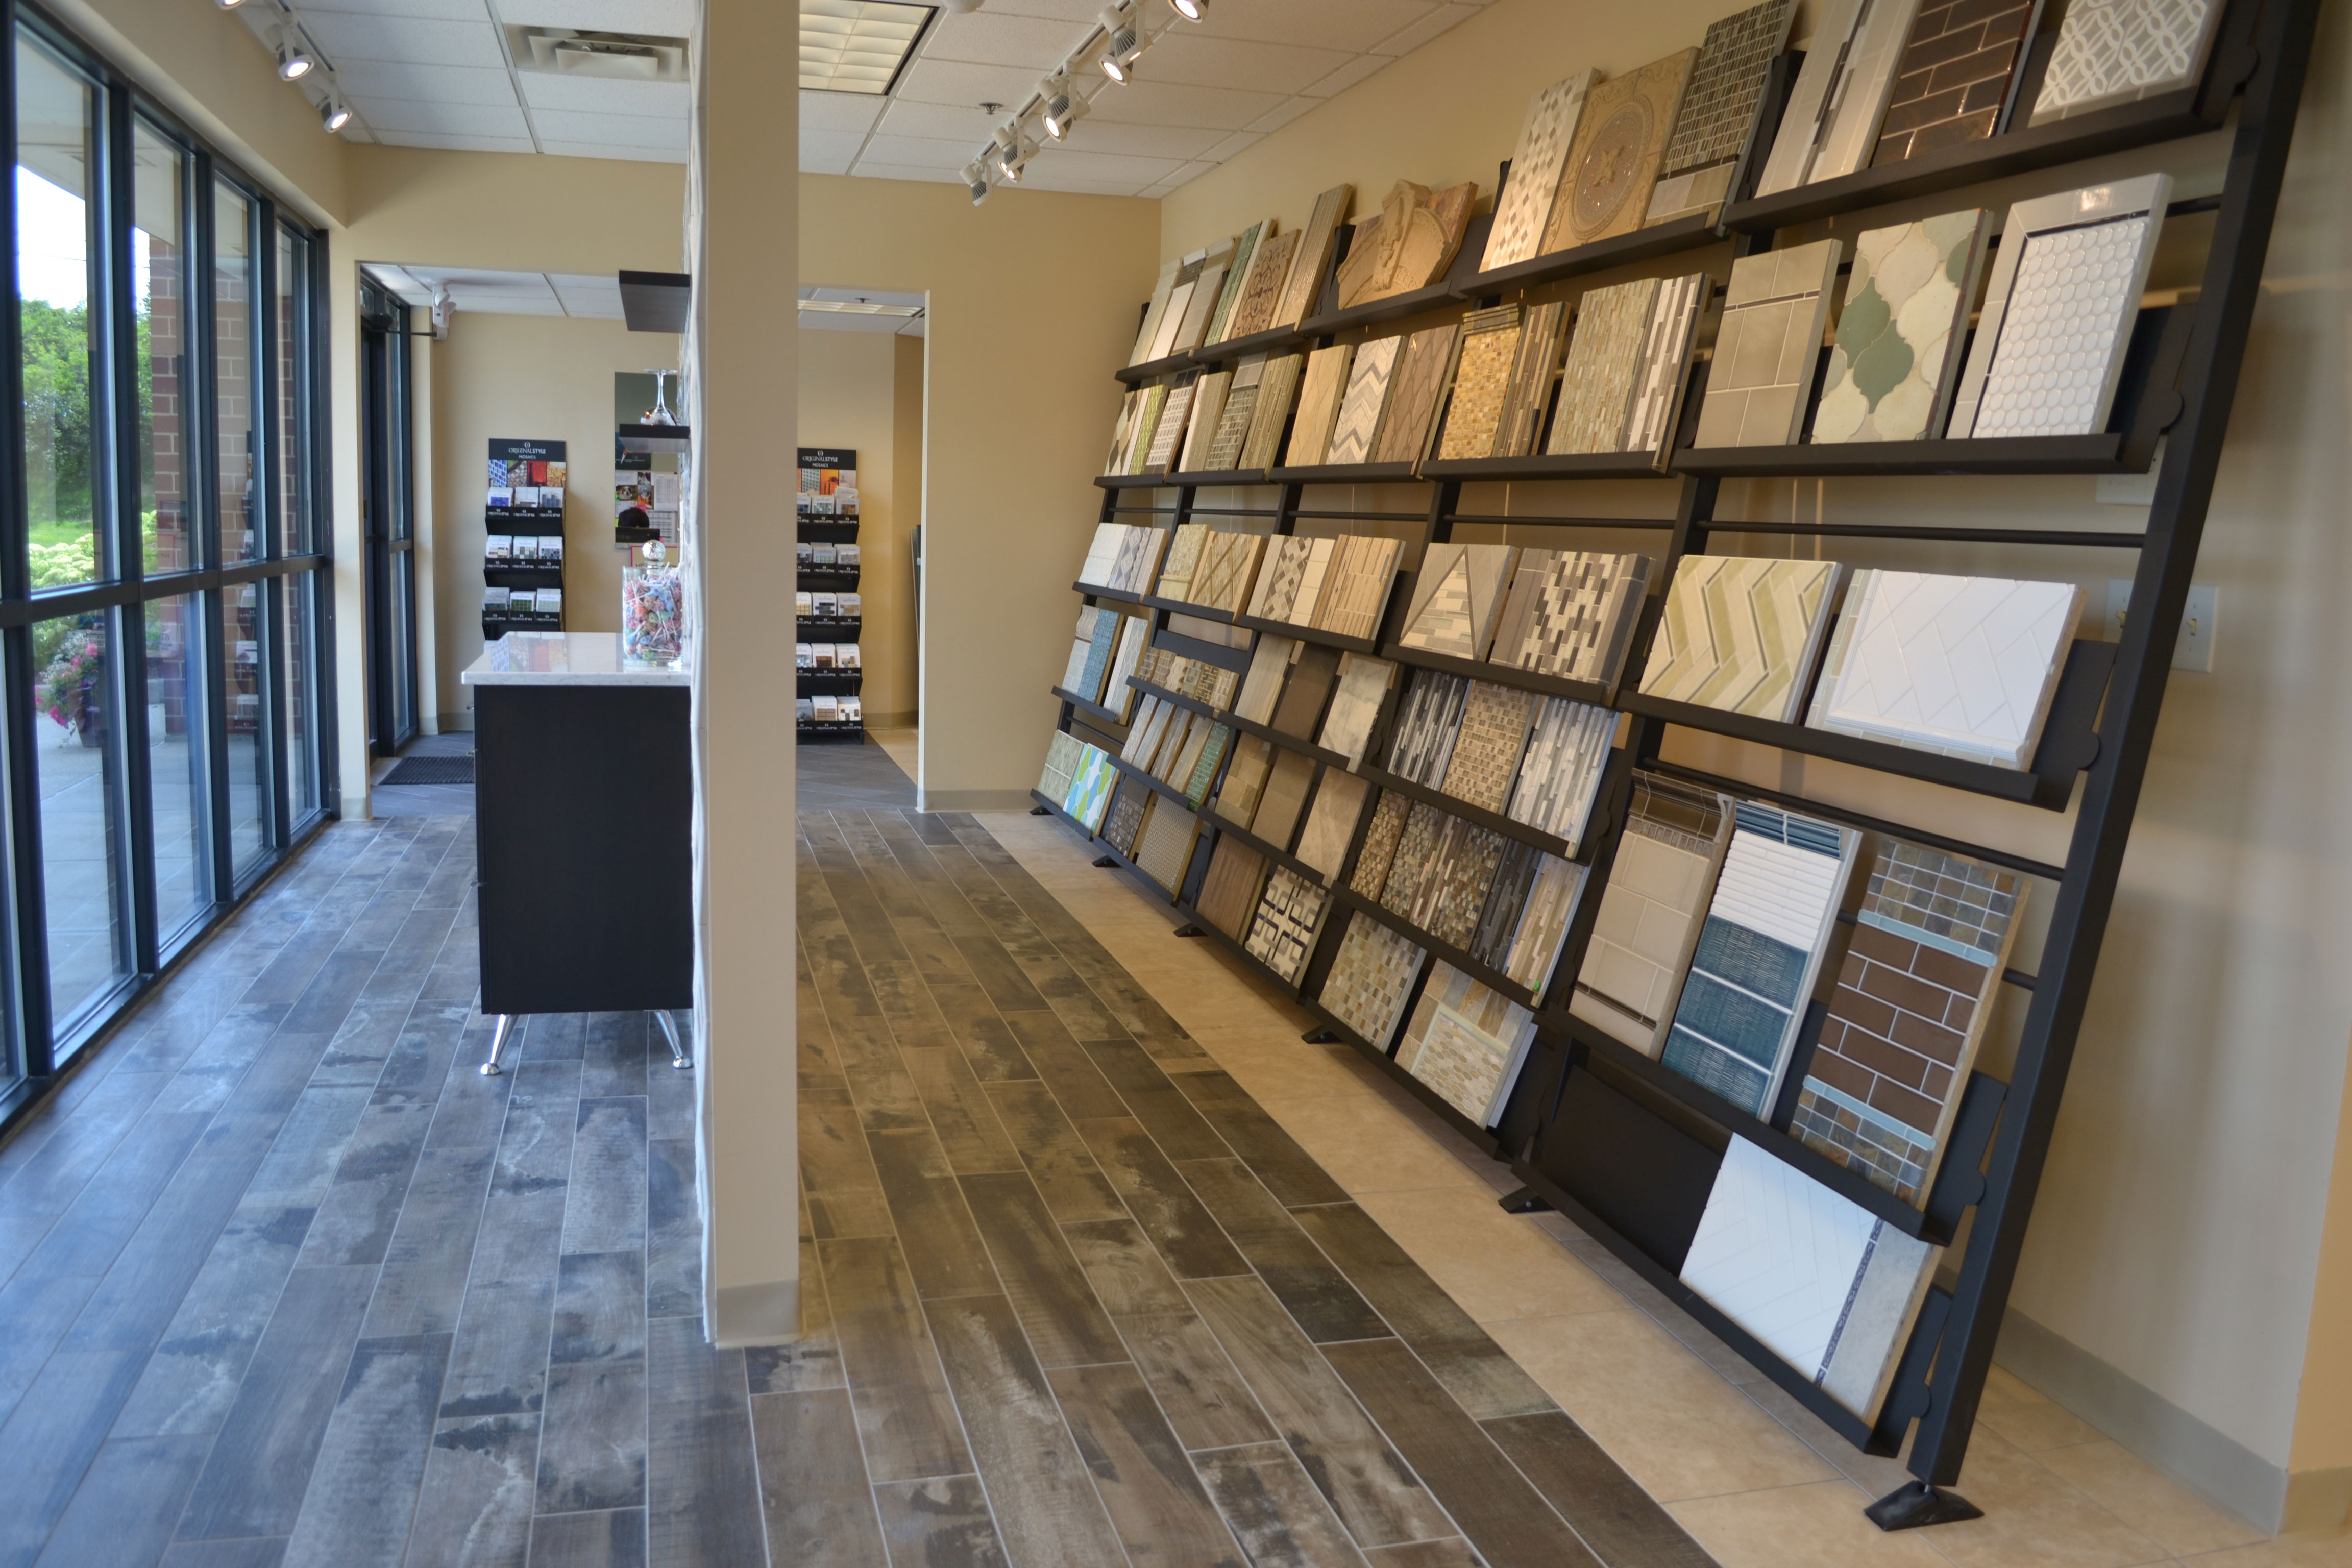 the hamilton parker company opens a new tile showroom in cincinnati rh prweb com hamilton parker fireplaces columbus ohio hamilton parker gas fireplace